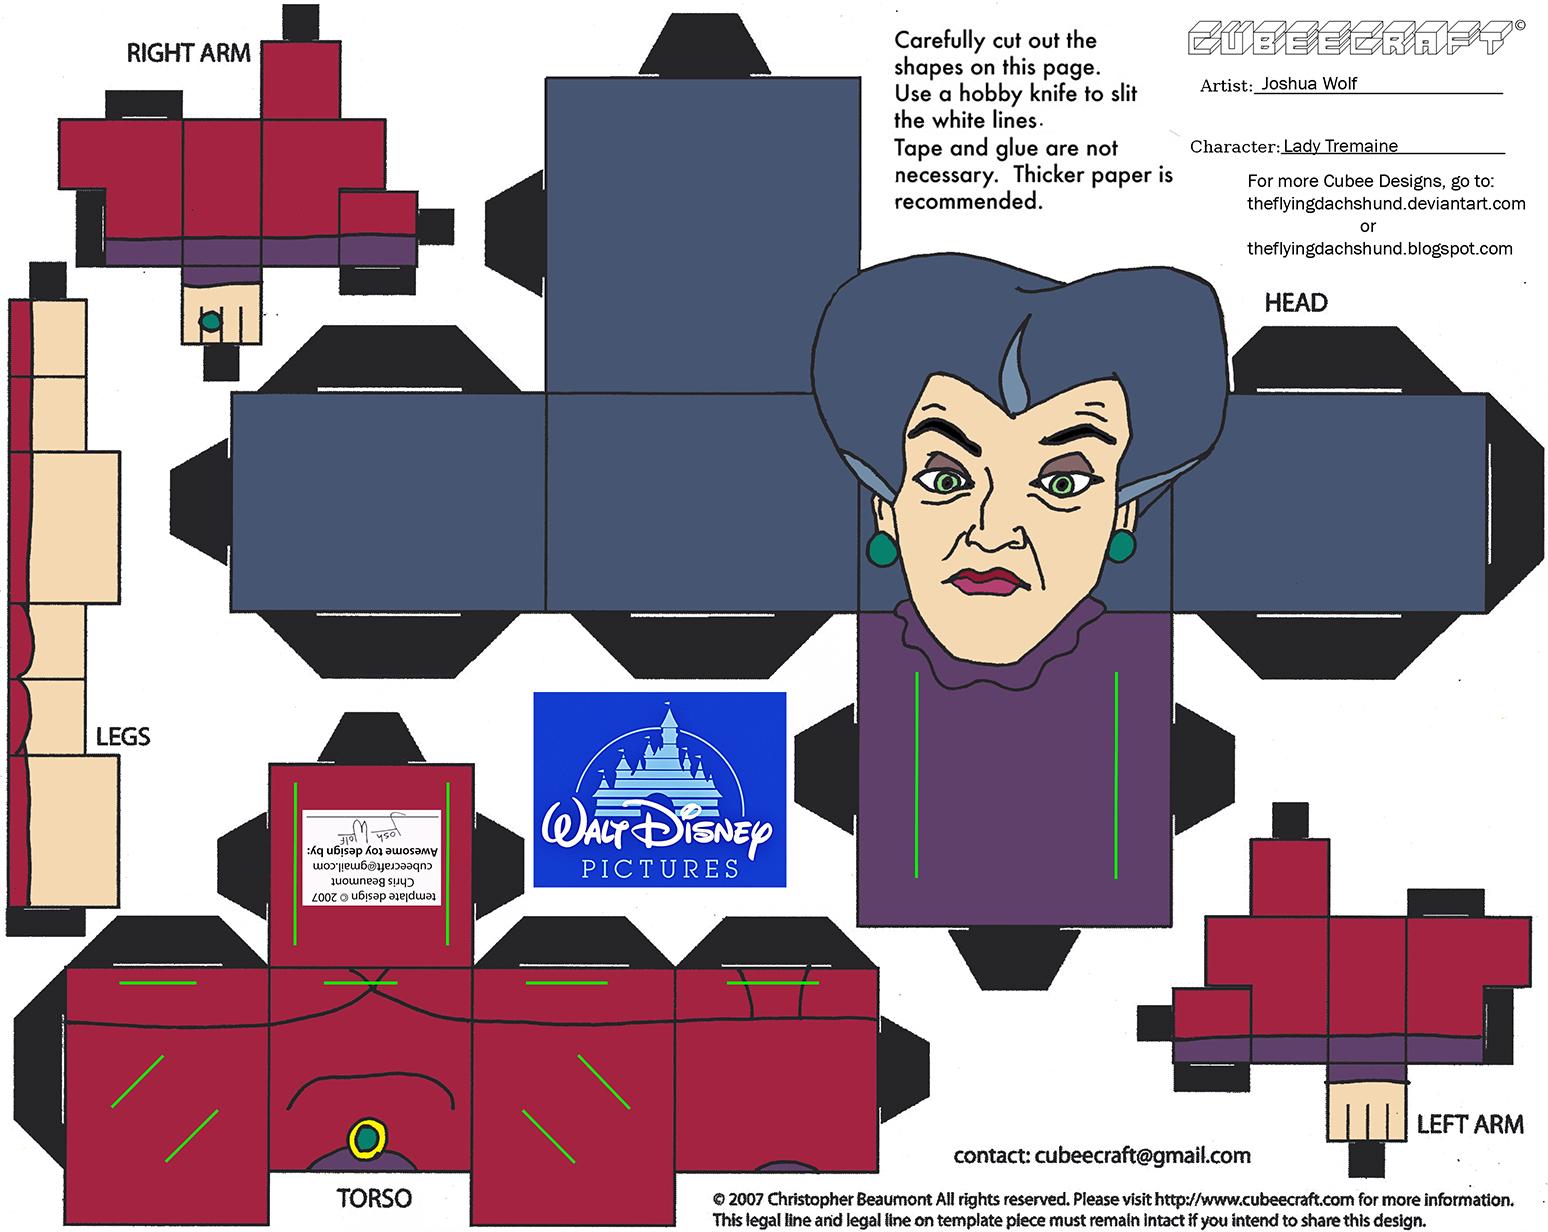 Dis44: Lady Tremaine Cubee